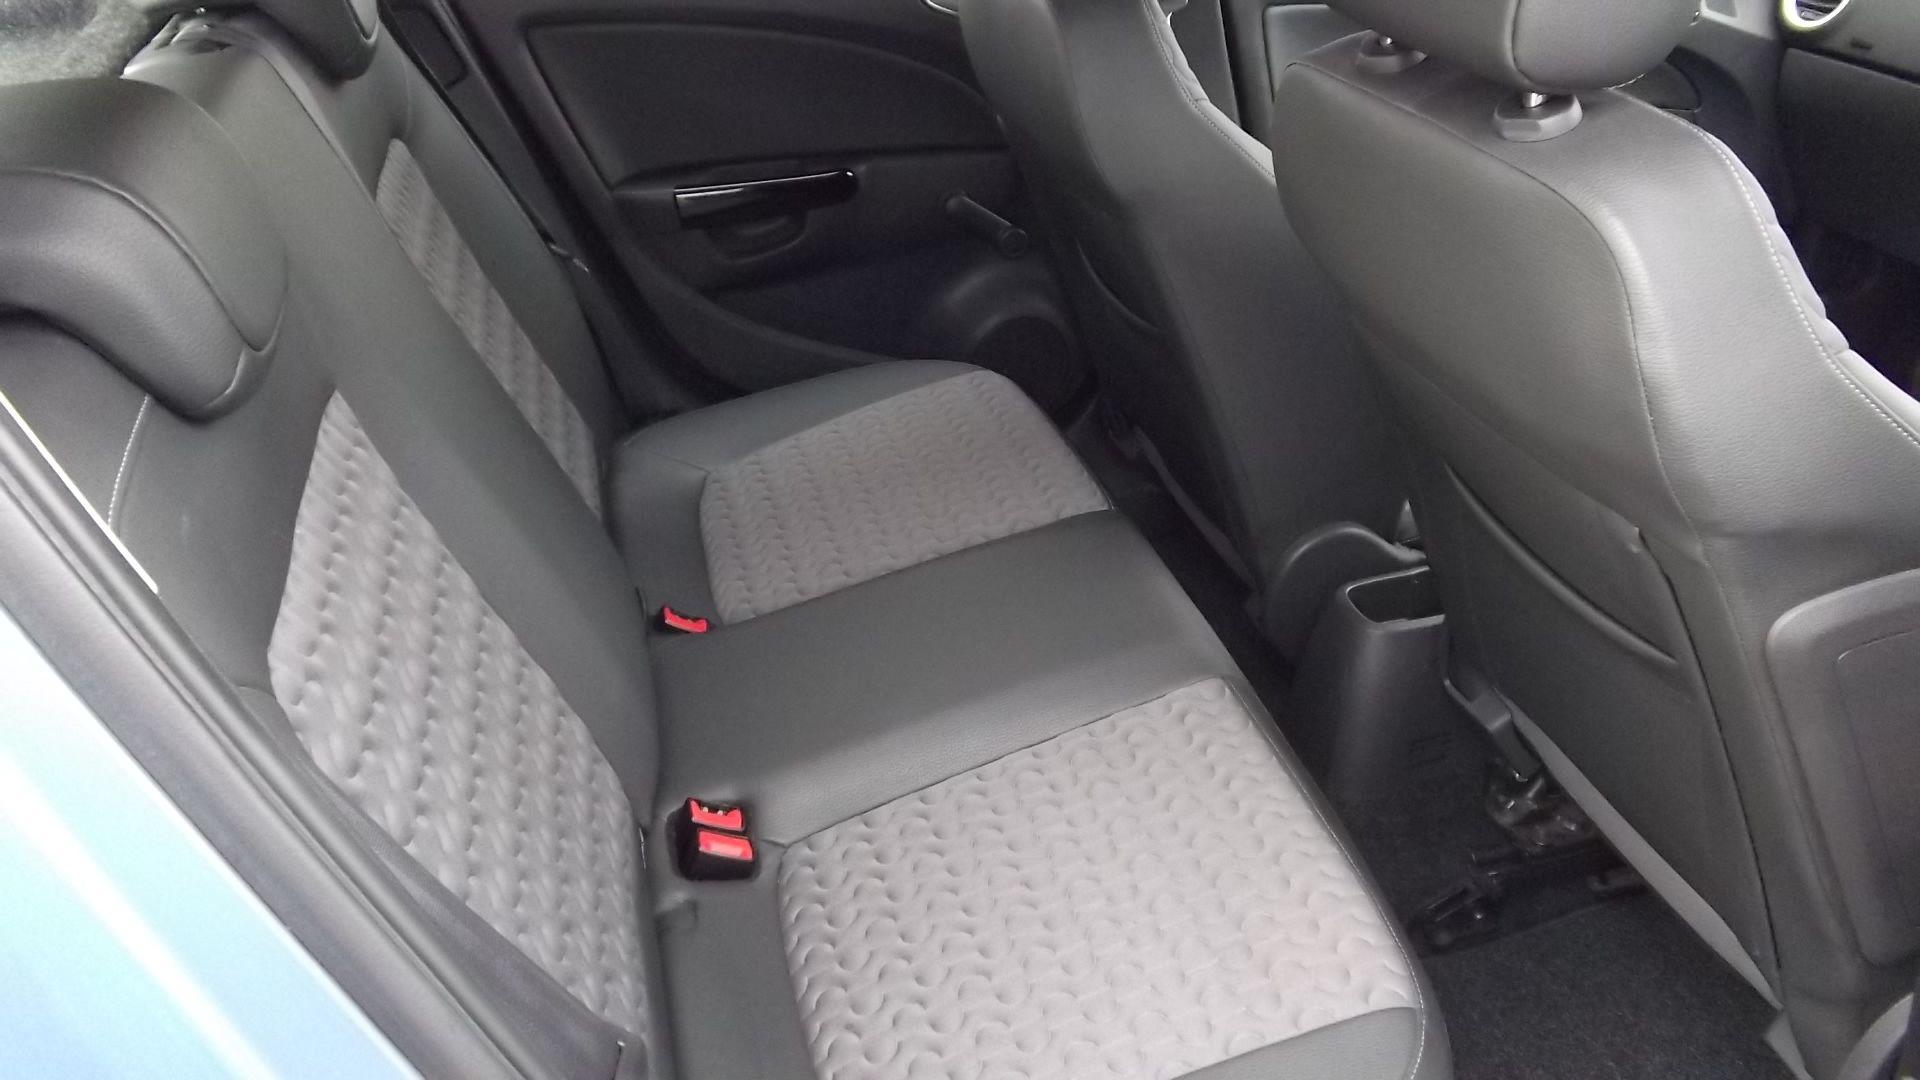 2014 Vauxhall Corsa Se 5Dr Hatchback - Full Service History - CL505 - NO VAT ON THE HAMMER - - Image 23 of 24